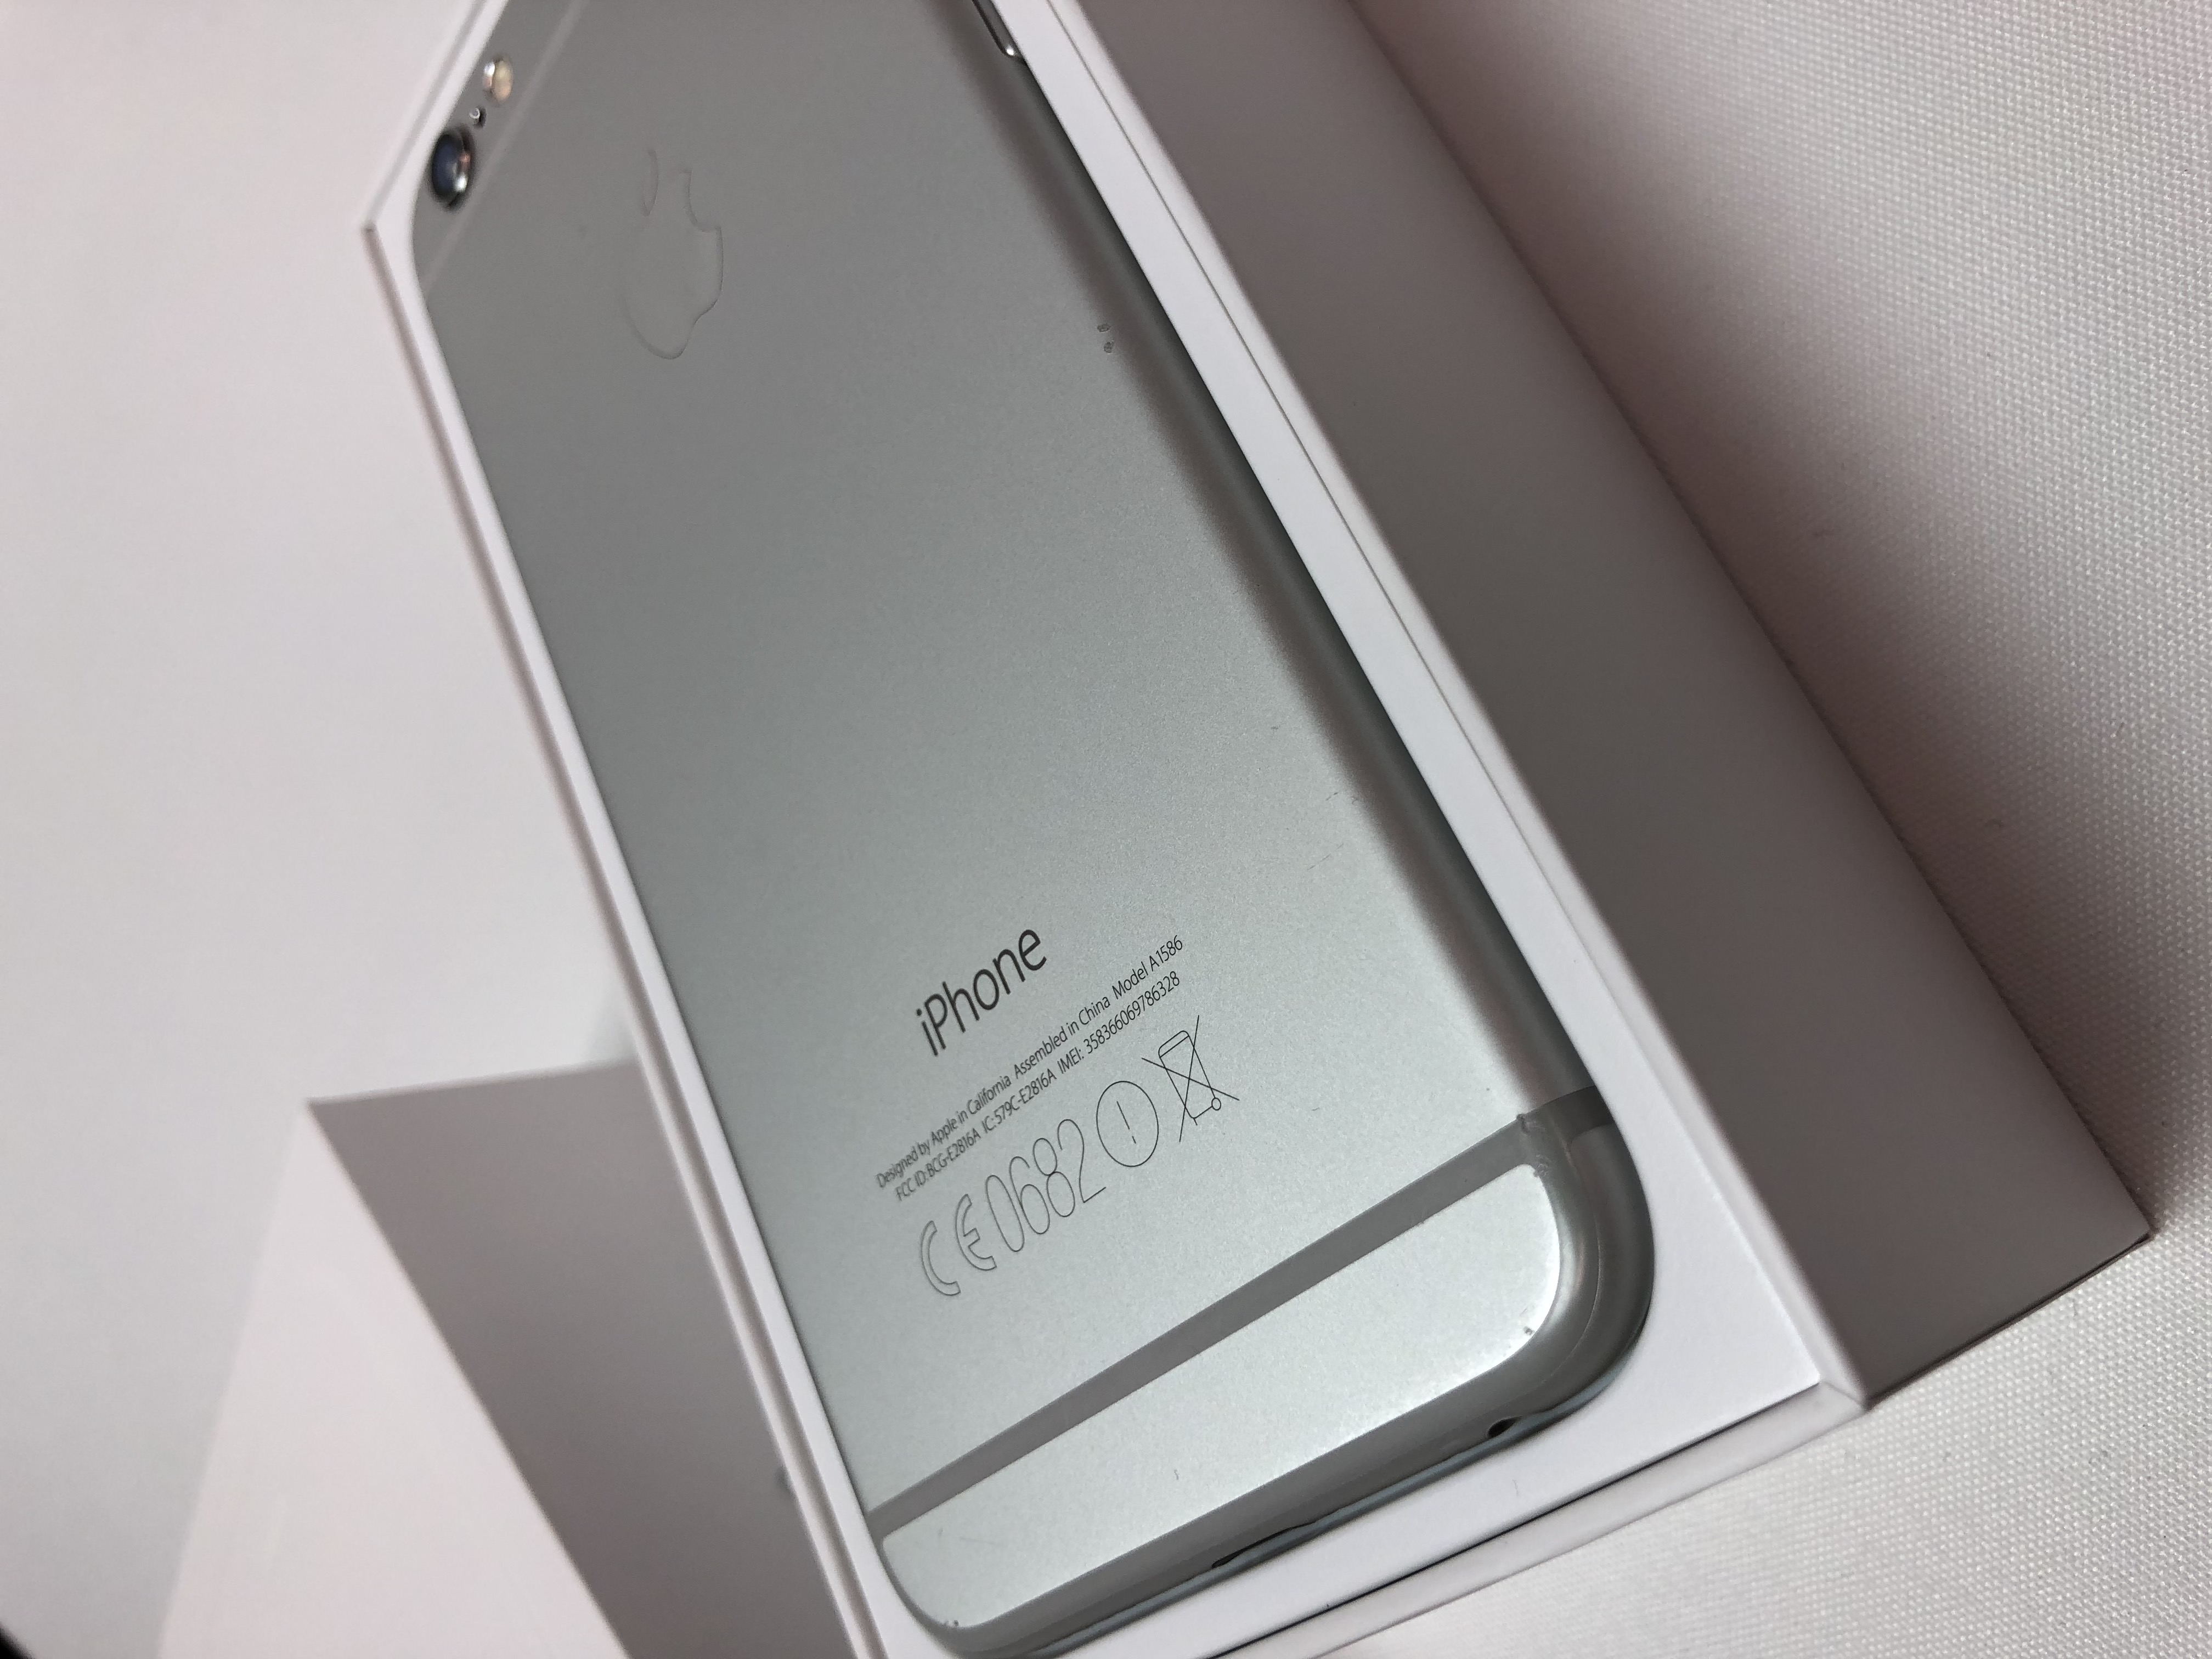 iPhone 6 16GB, 16 GB, Silver, Kuva 2